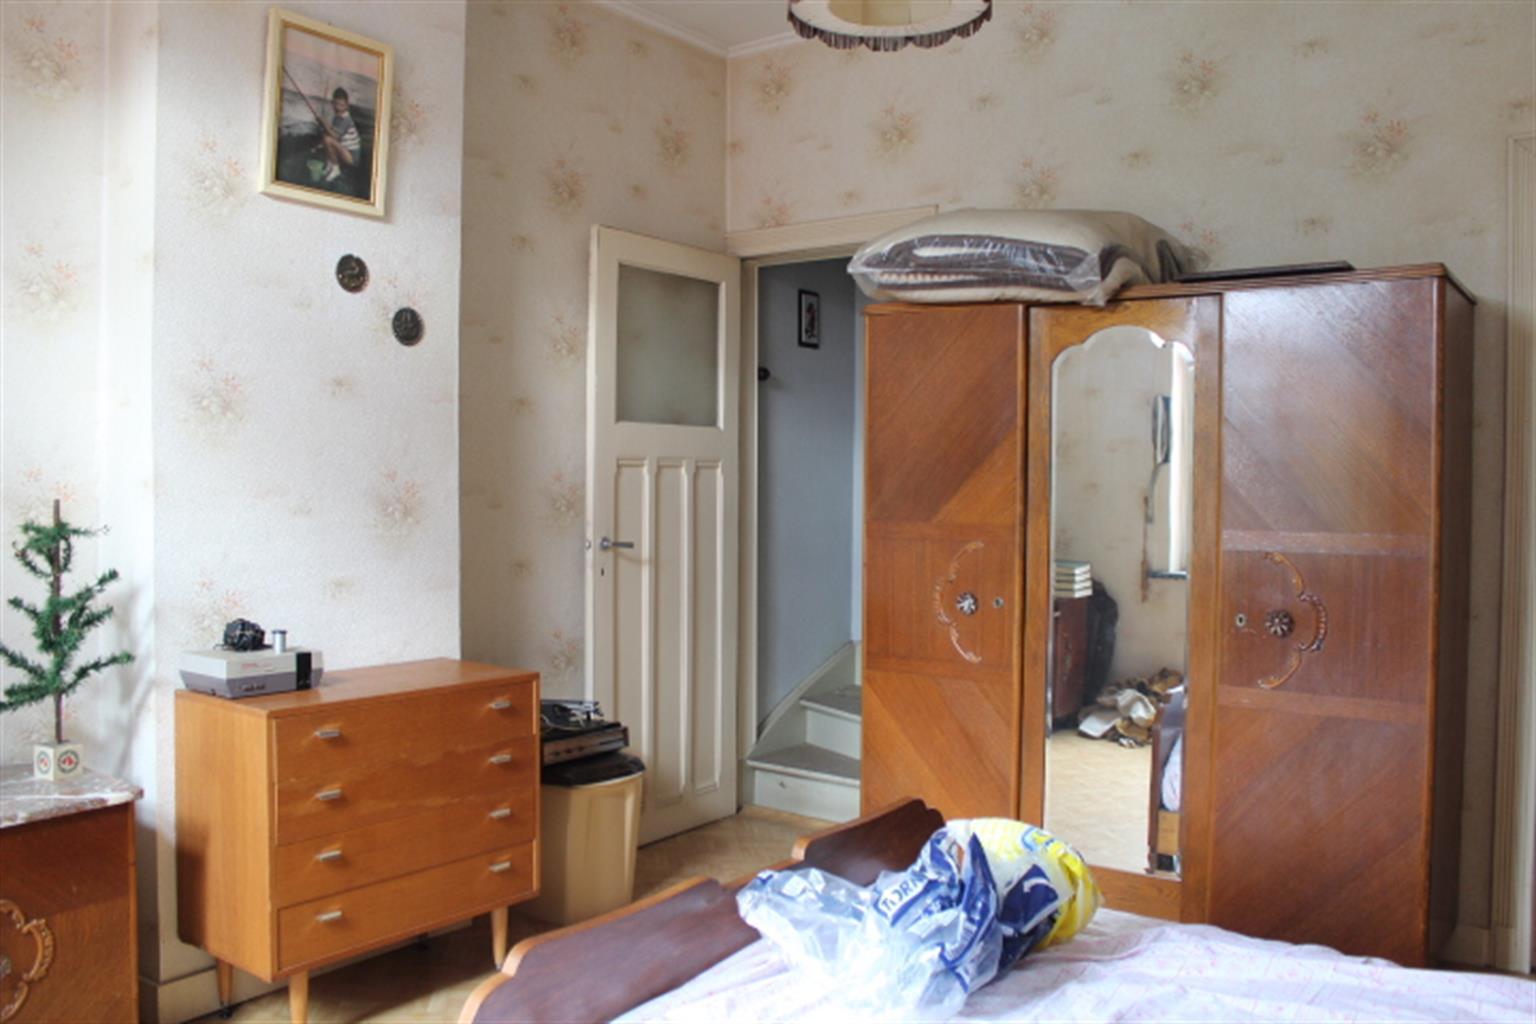 Maison - Beyne-Heusay - #4312164-10